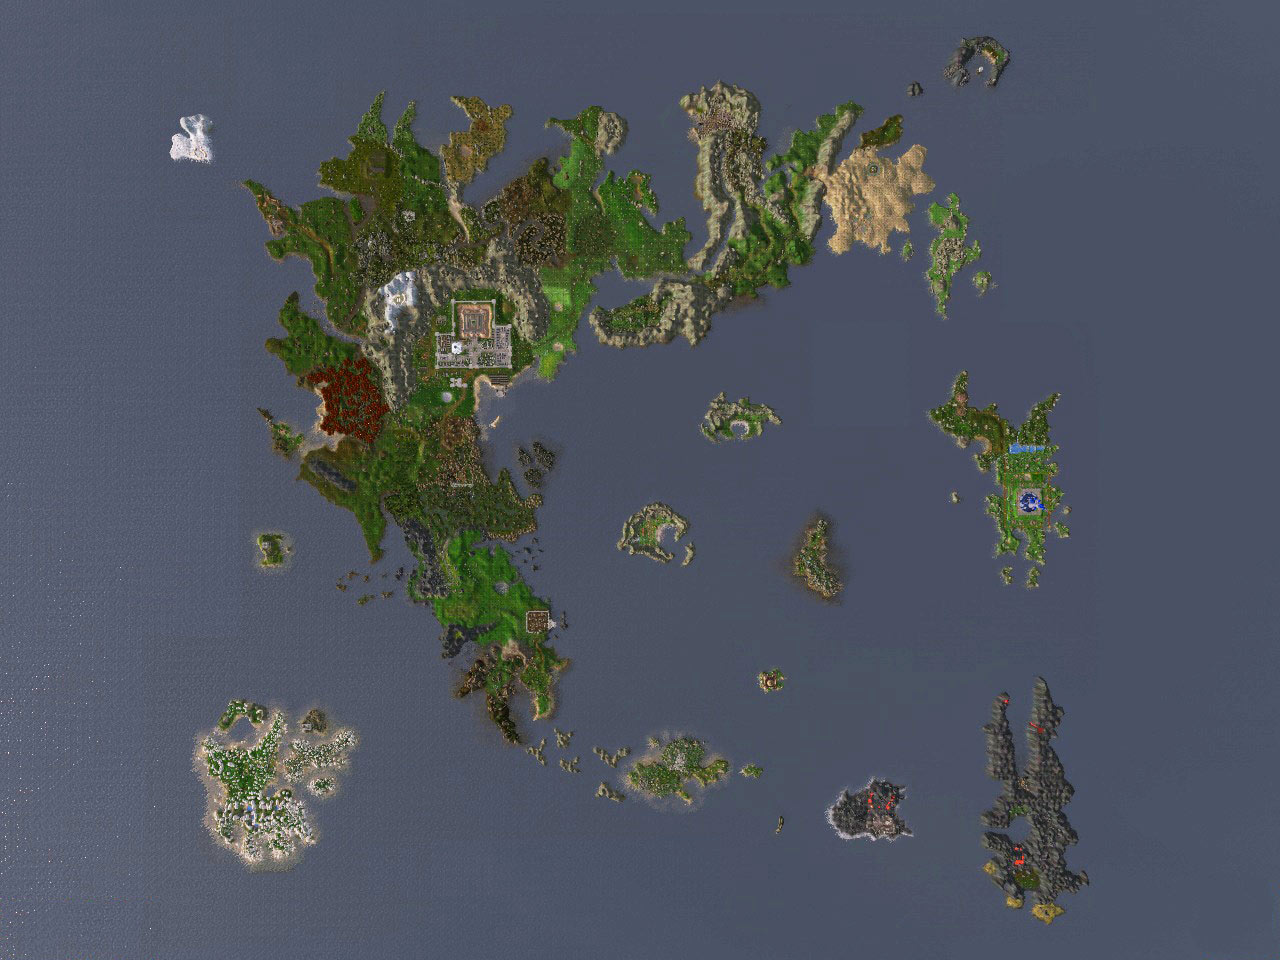 Worldmap Image Ultima Ix Redemption Mod For Elder Scrolls Iii